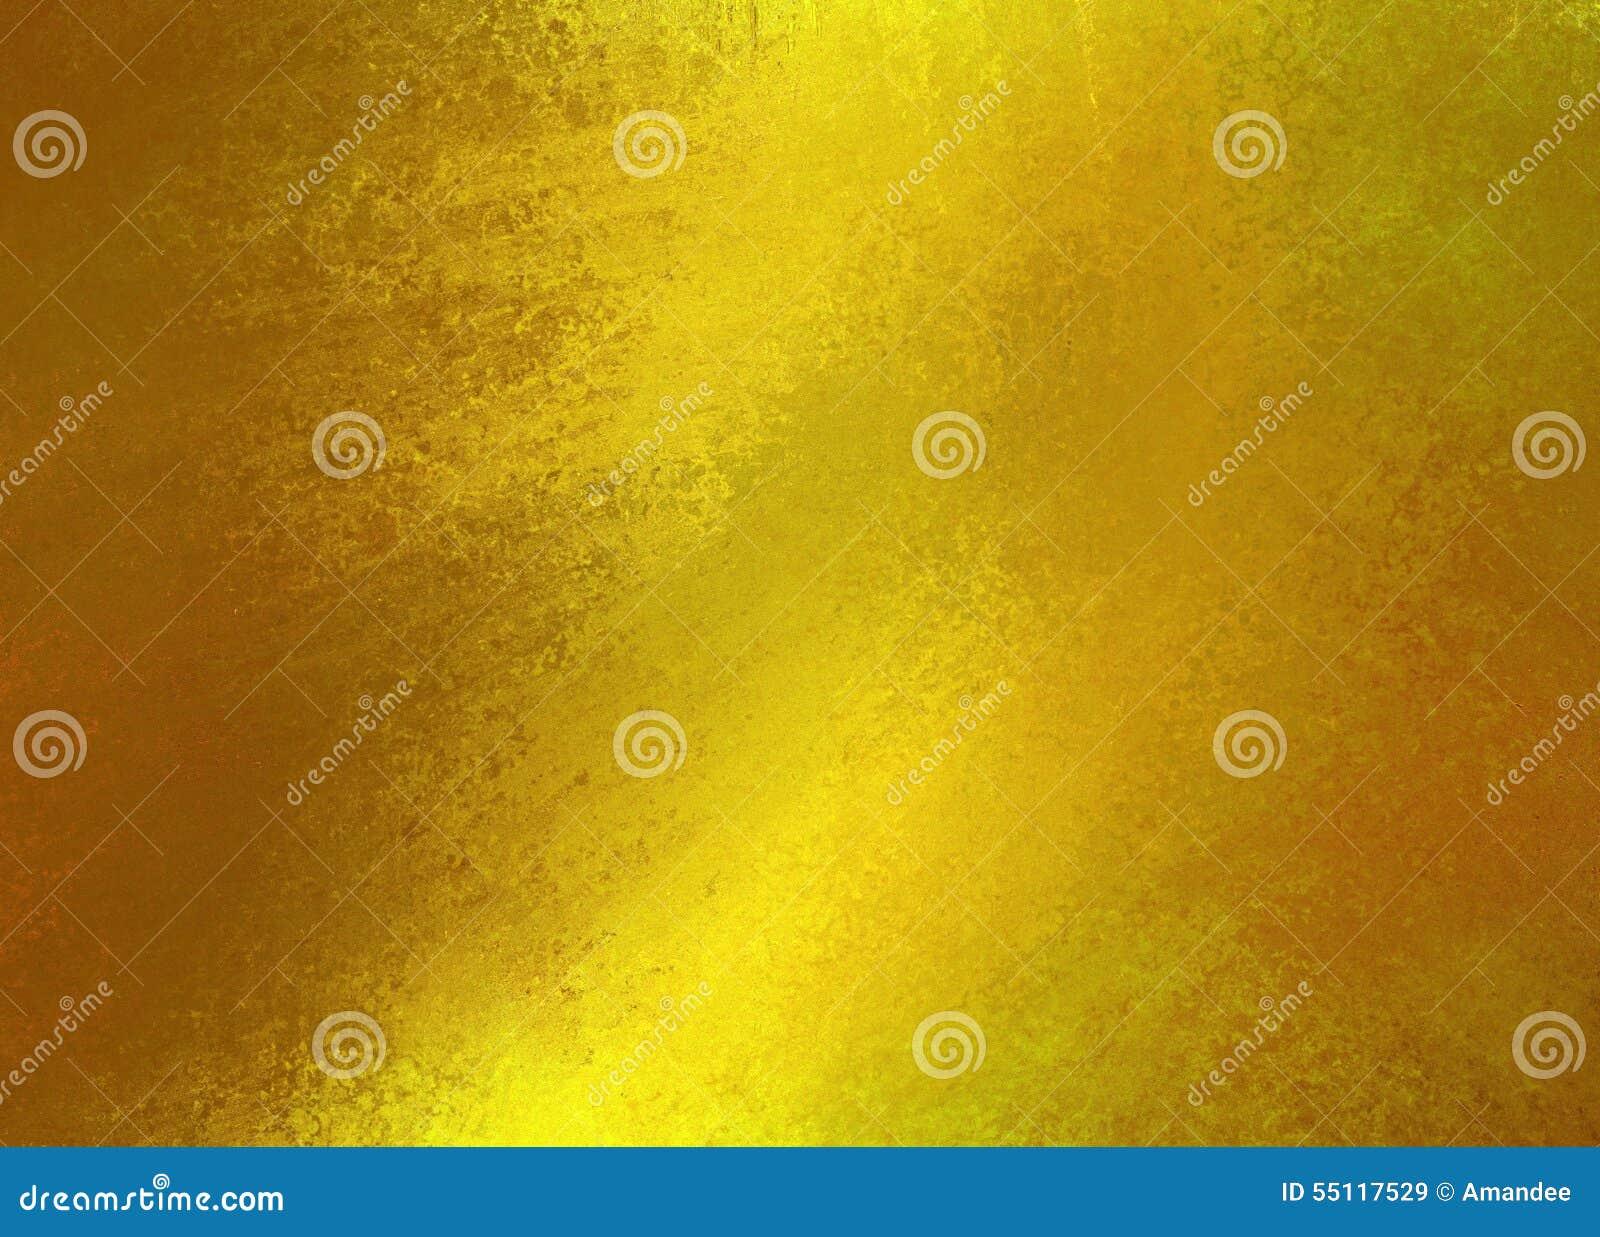 Shiny gold textured background